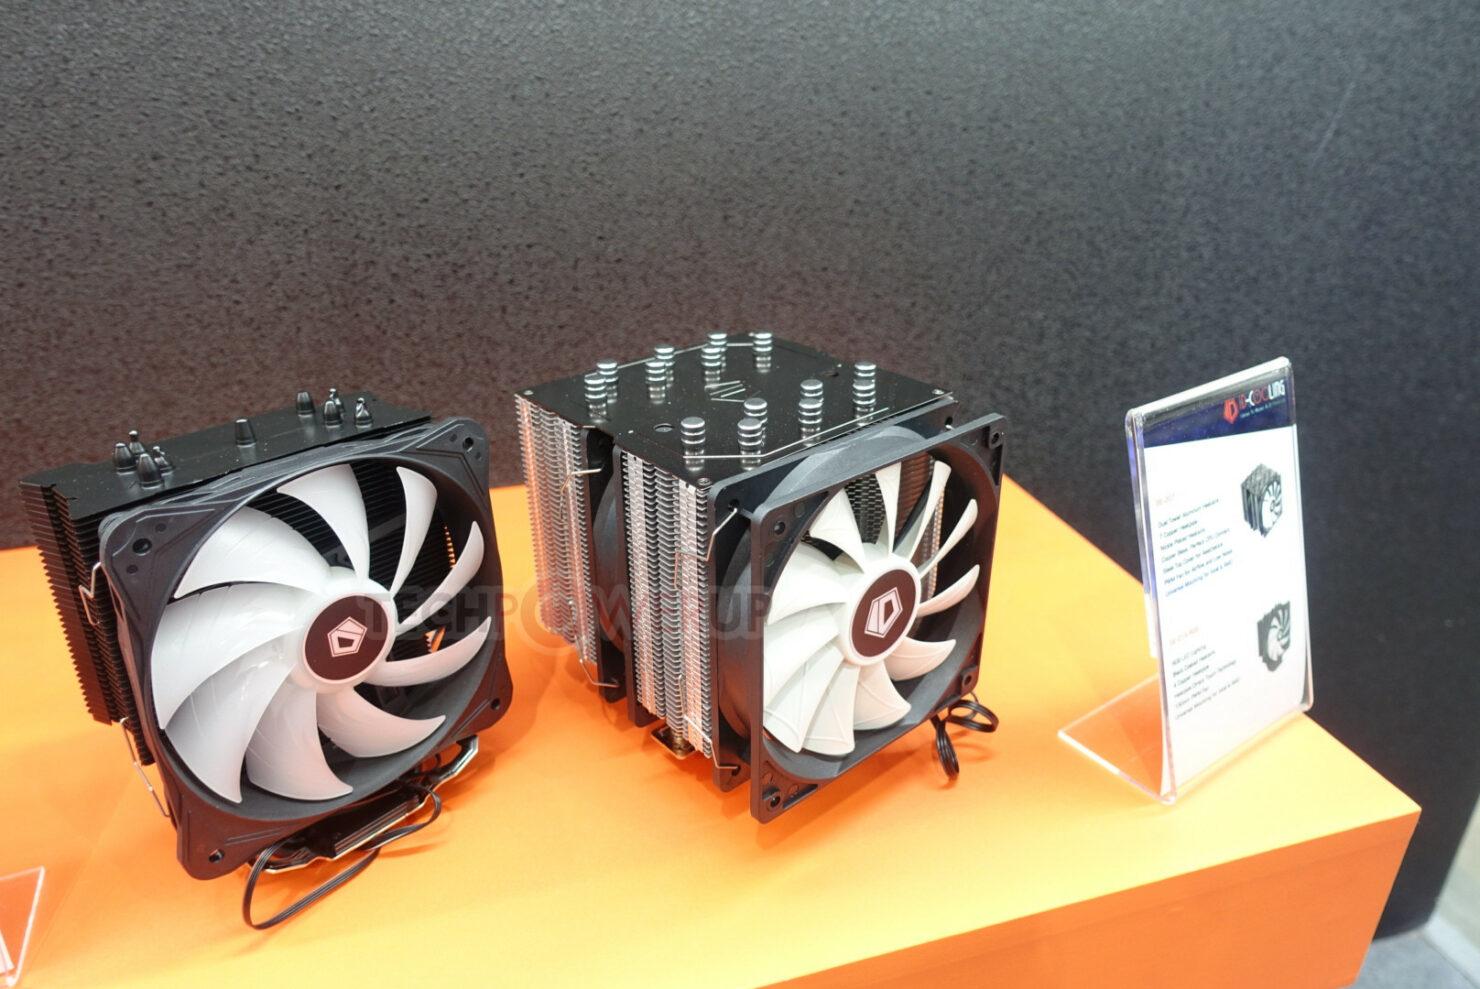 wccftech-id-cooling-computex-3